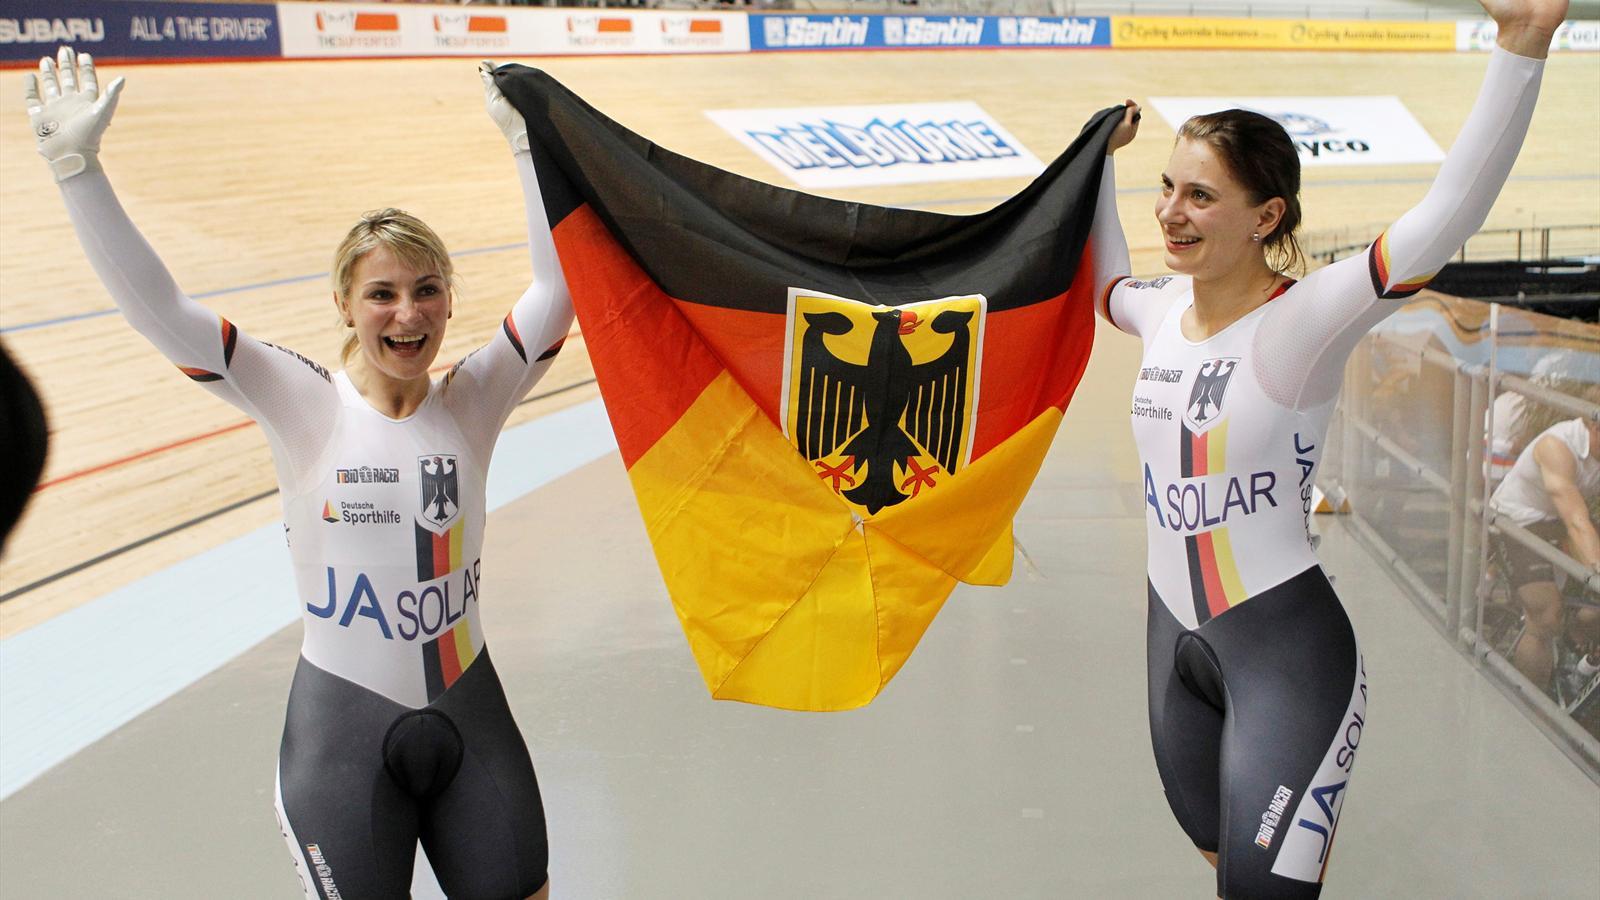 Germany beat Australia - Cycling - Eurosport Australia